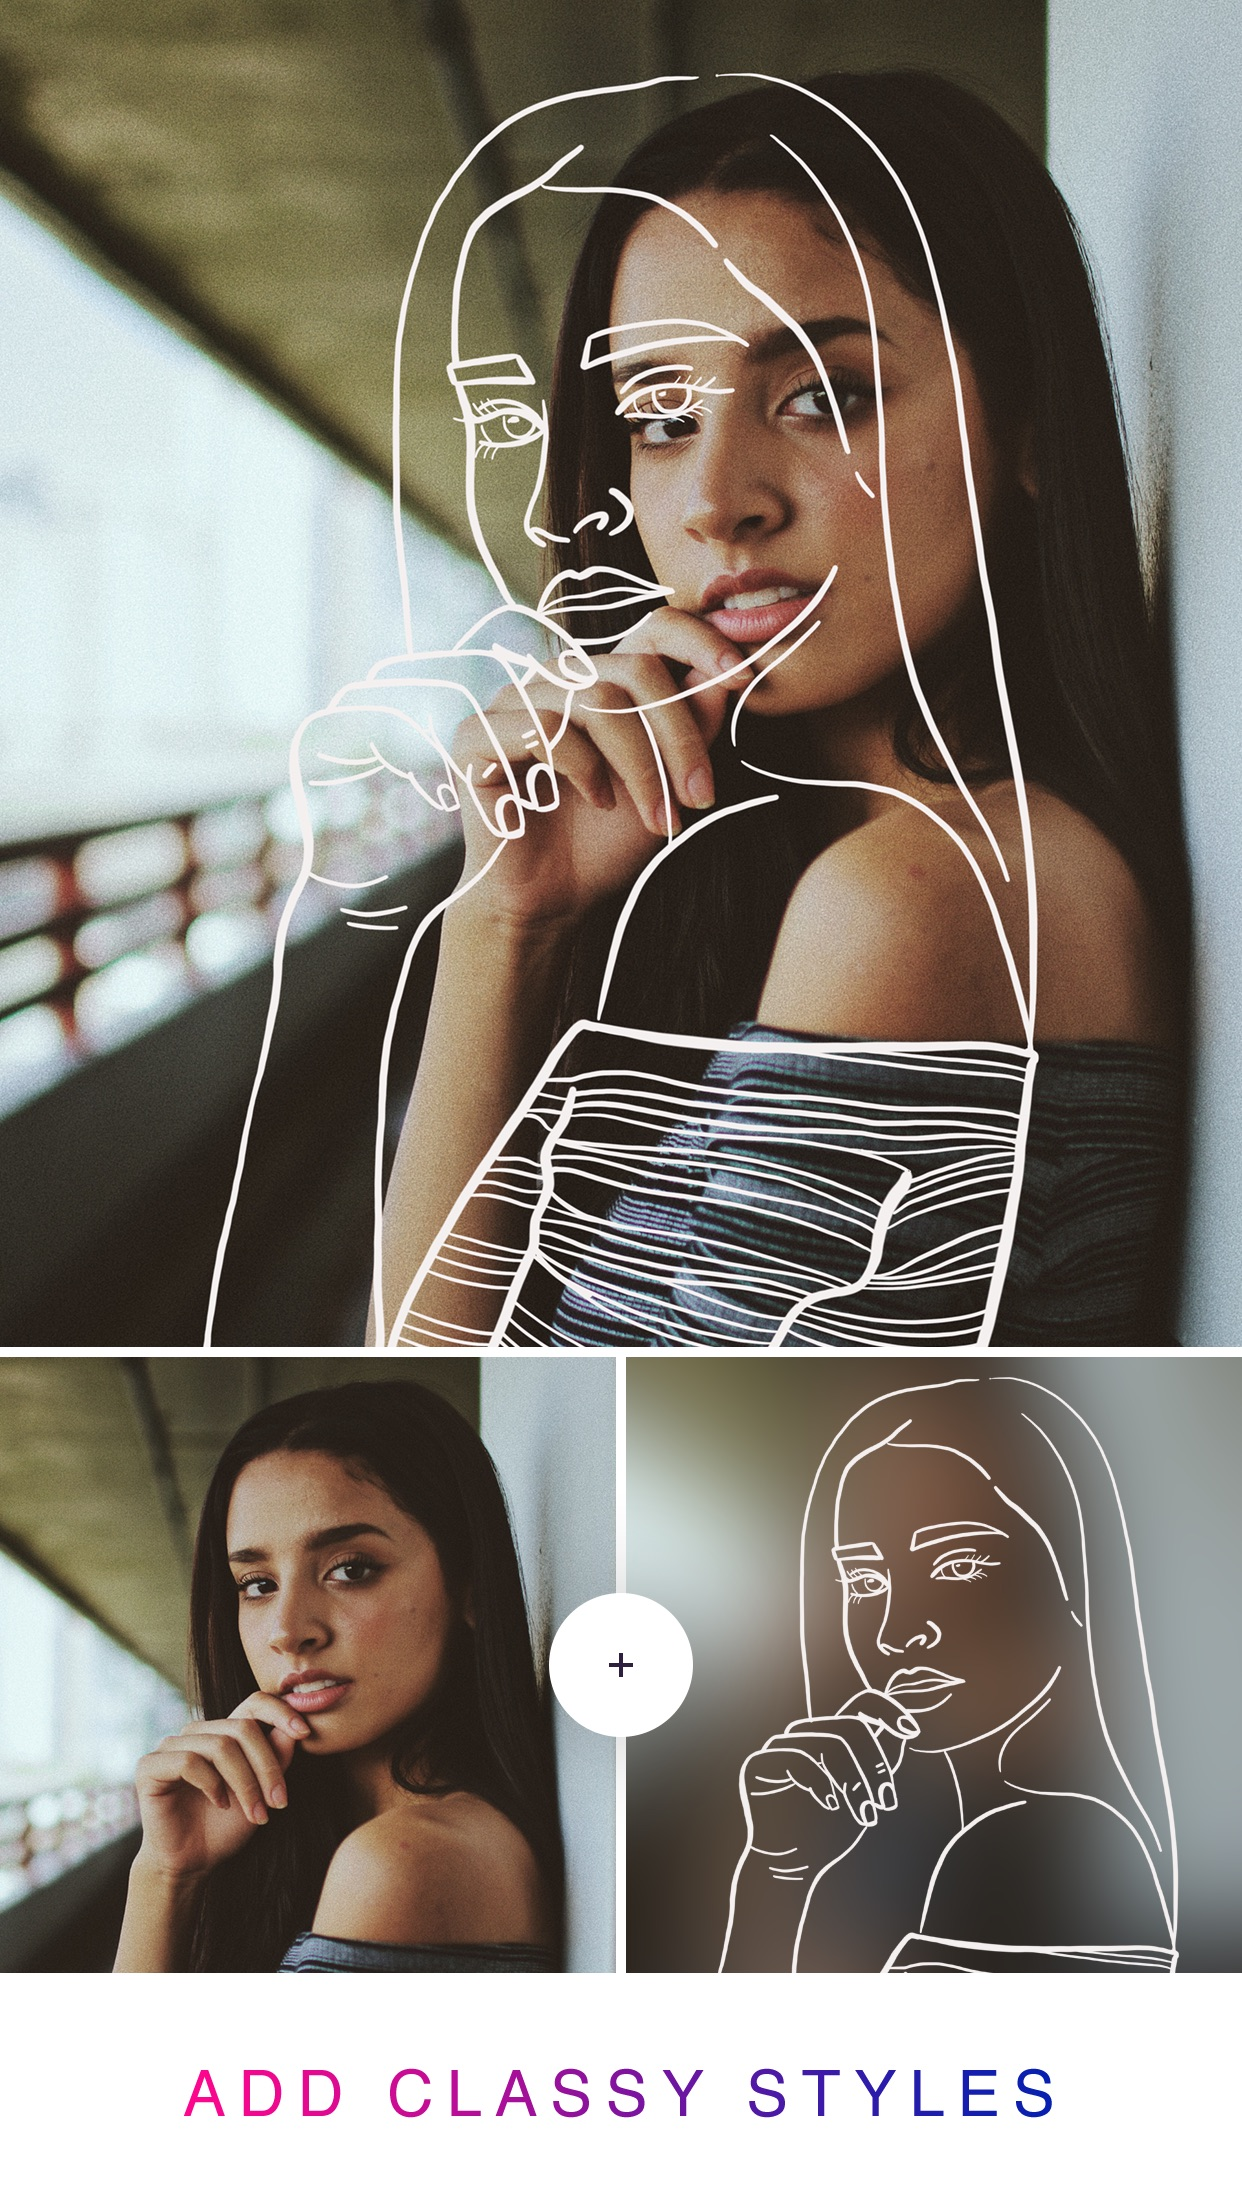 Photo Lab: Art Picture Editor Screenshot